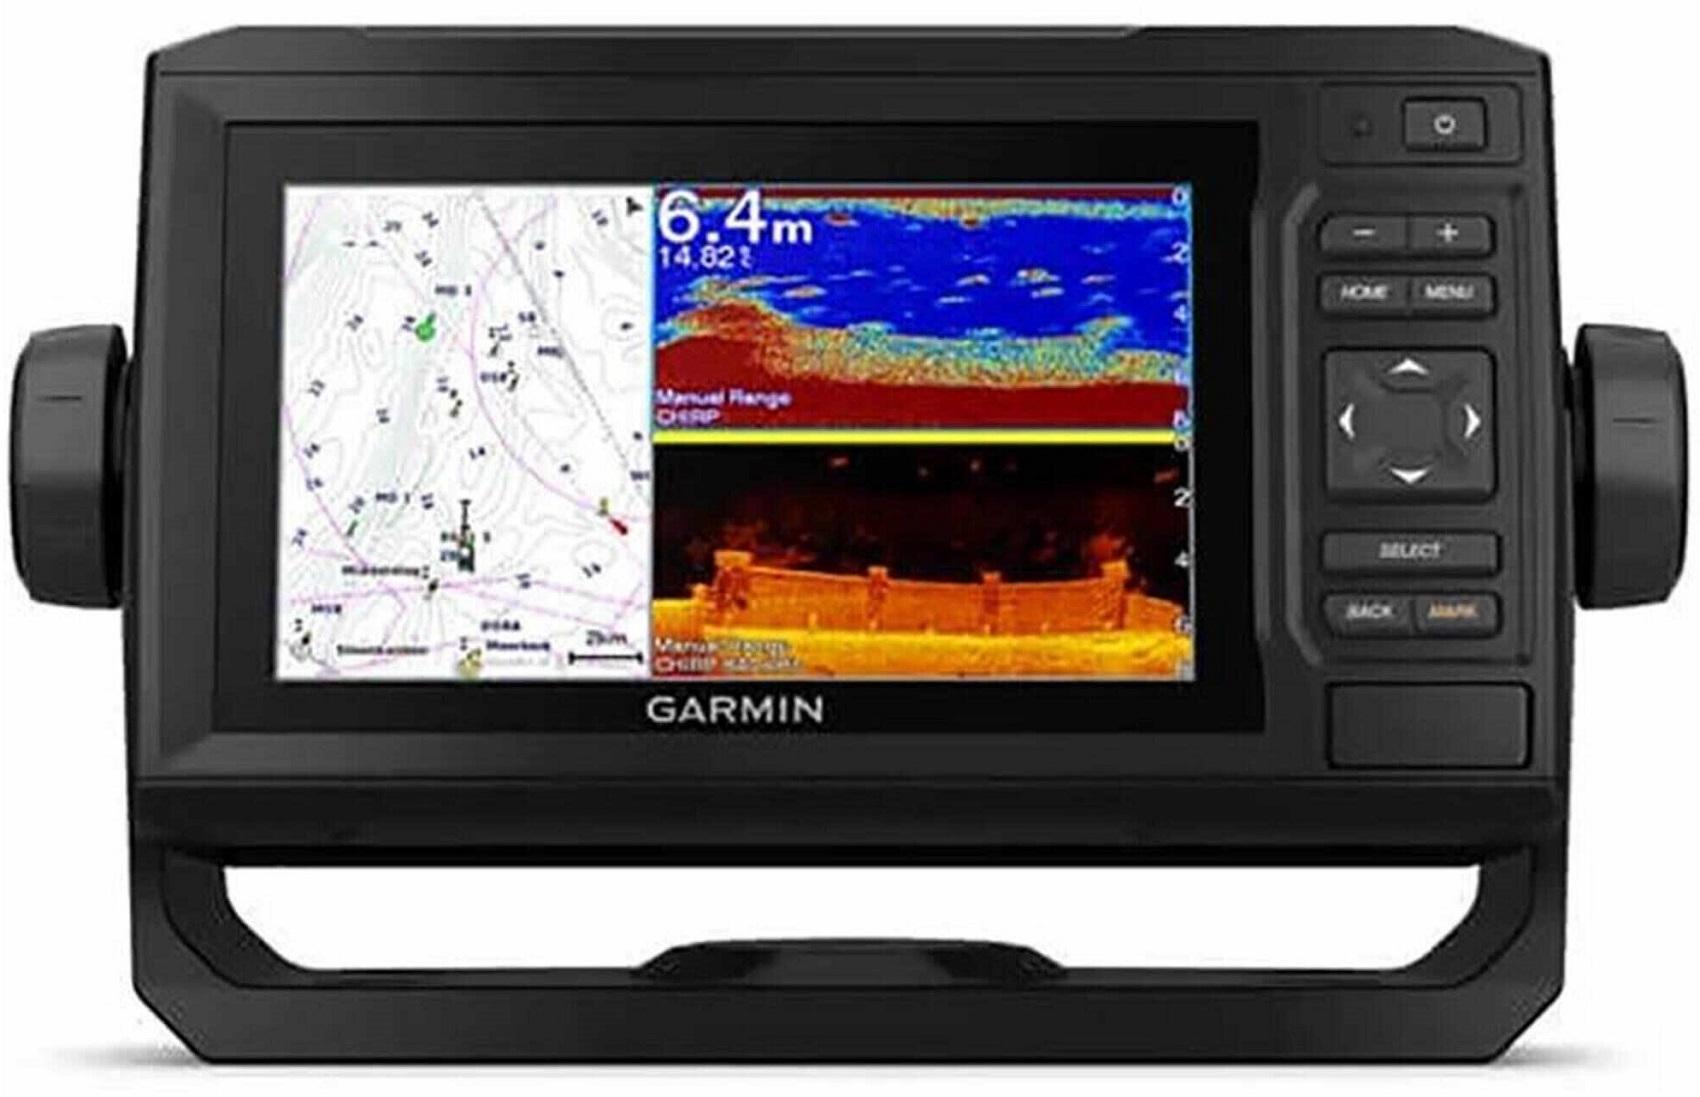 Gps Sonar Garmin Echomap UHD 62CV 010-02329-01 e Carta Náutica Bluechart G3 010-C1062-20